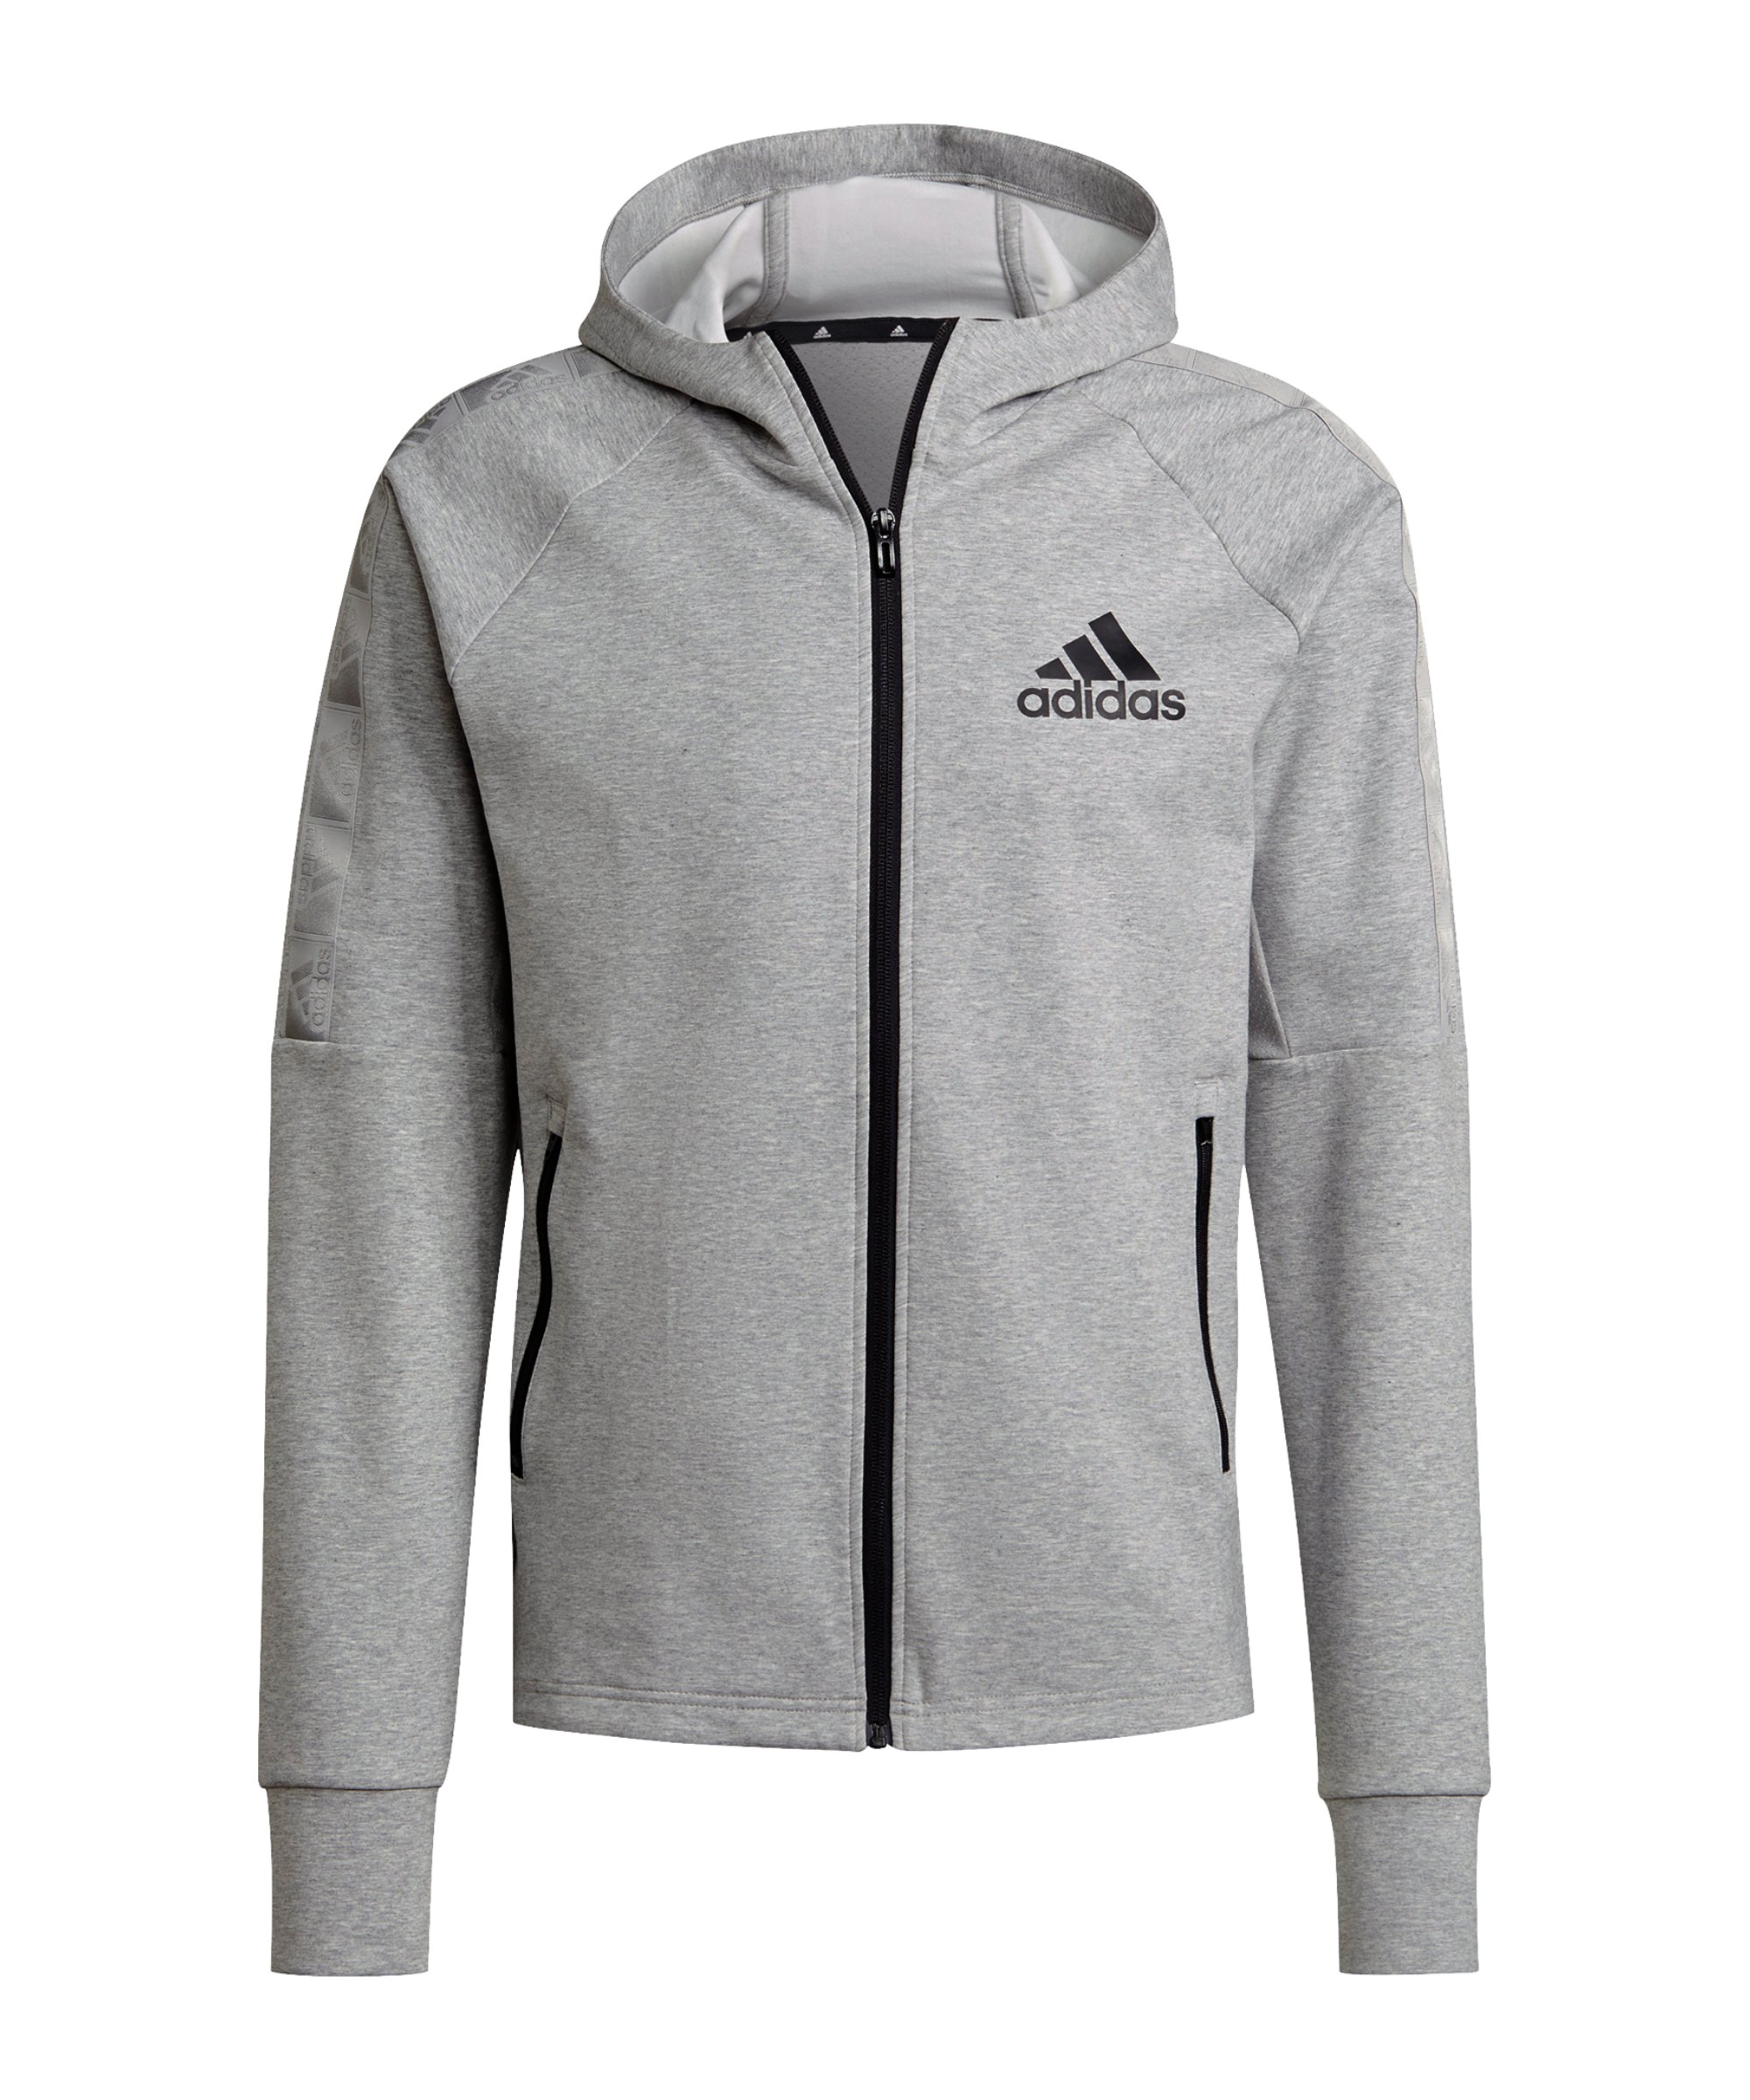 adidas D2M Kapuzenjacke Grau Schwarz - grau